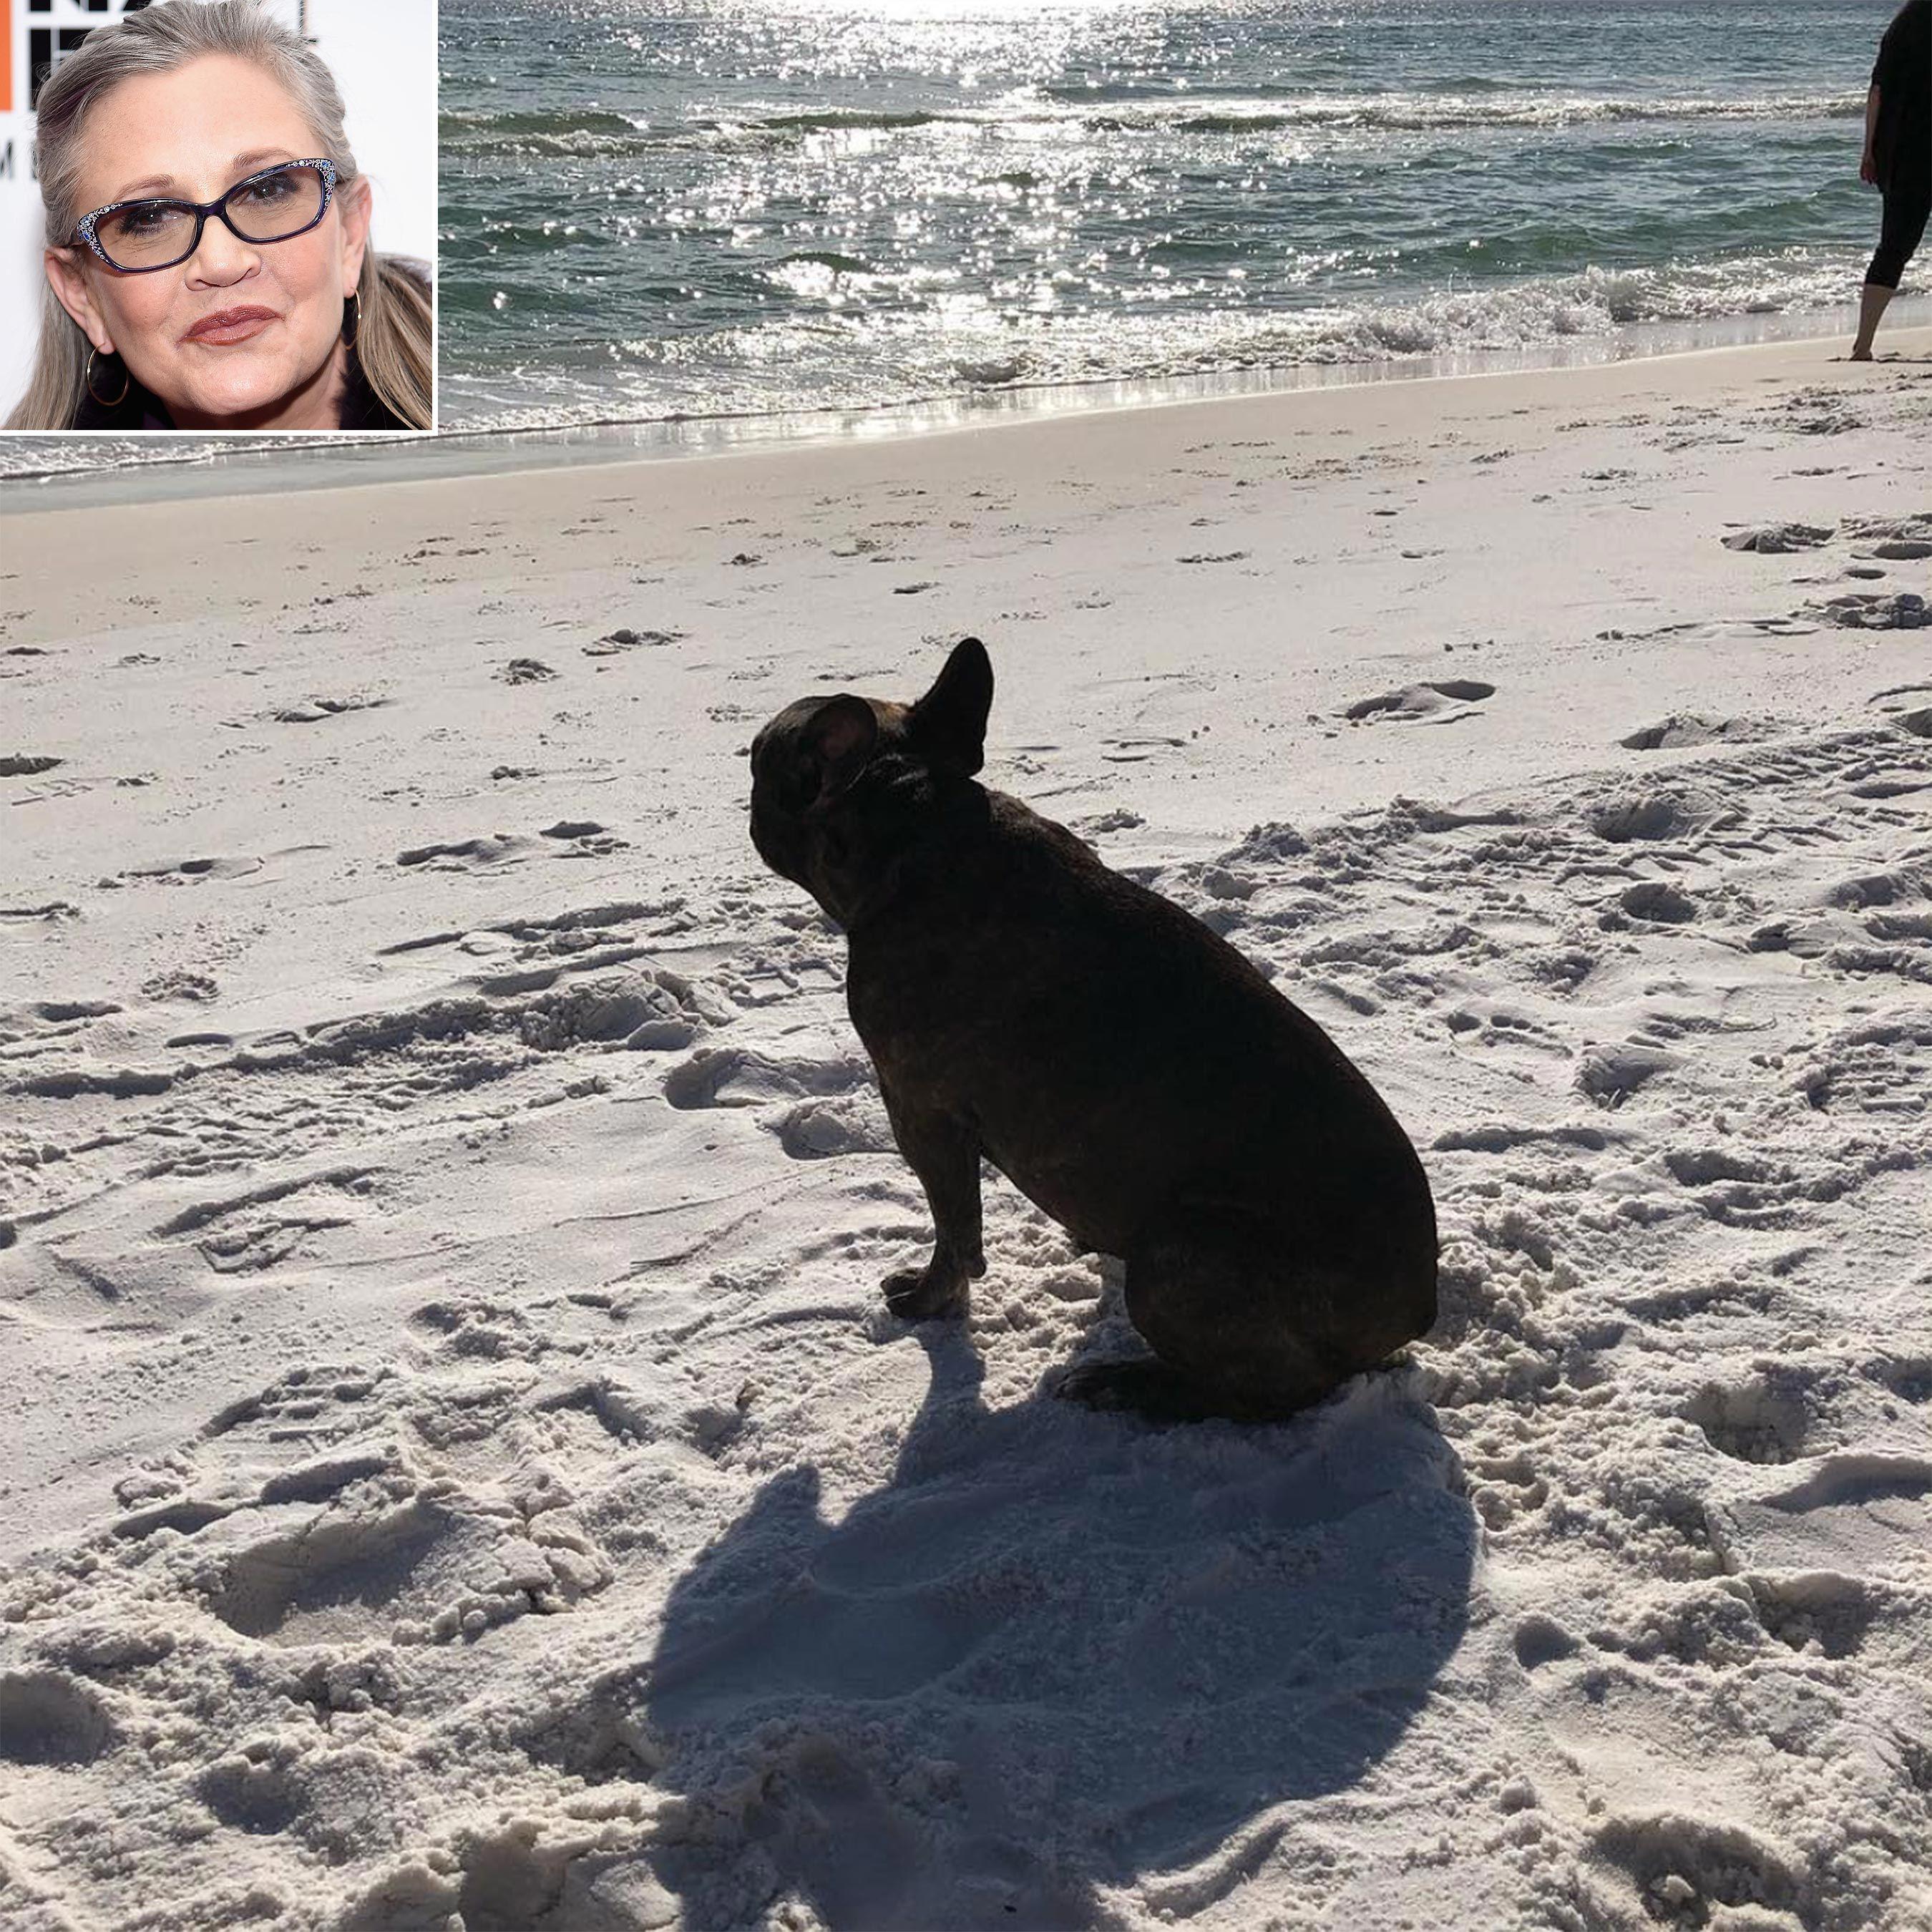 Gary, el perro de Carrie Fisher, se retira a Florida - Star Wars